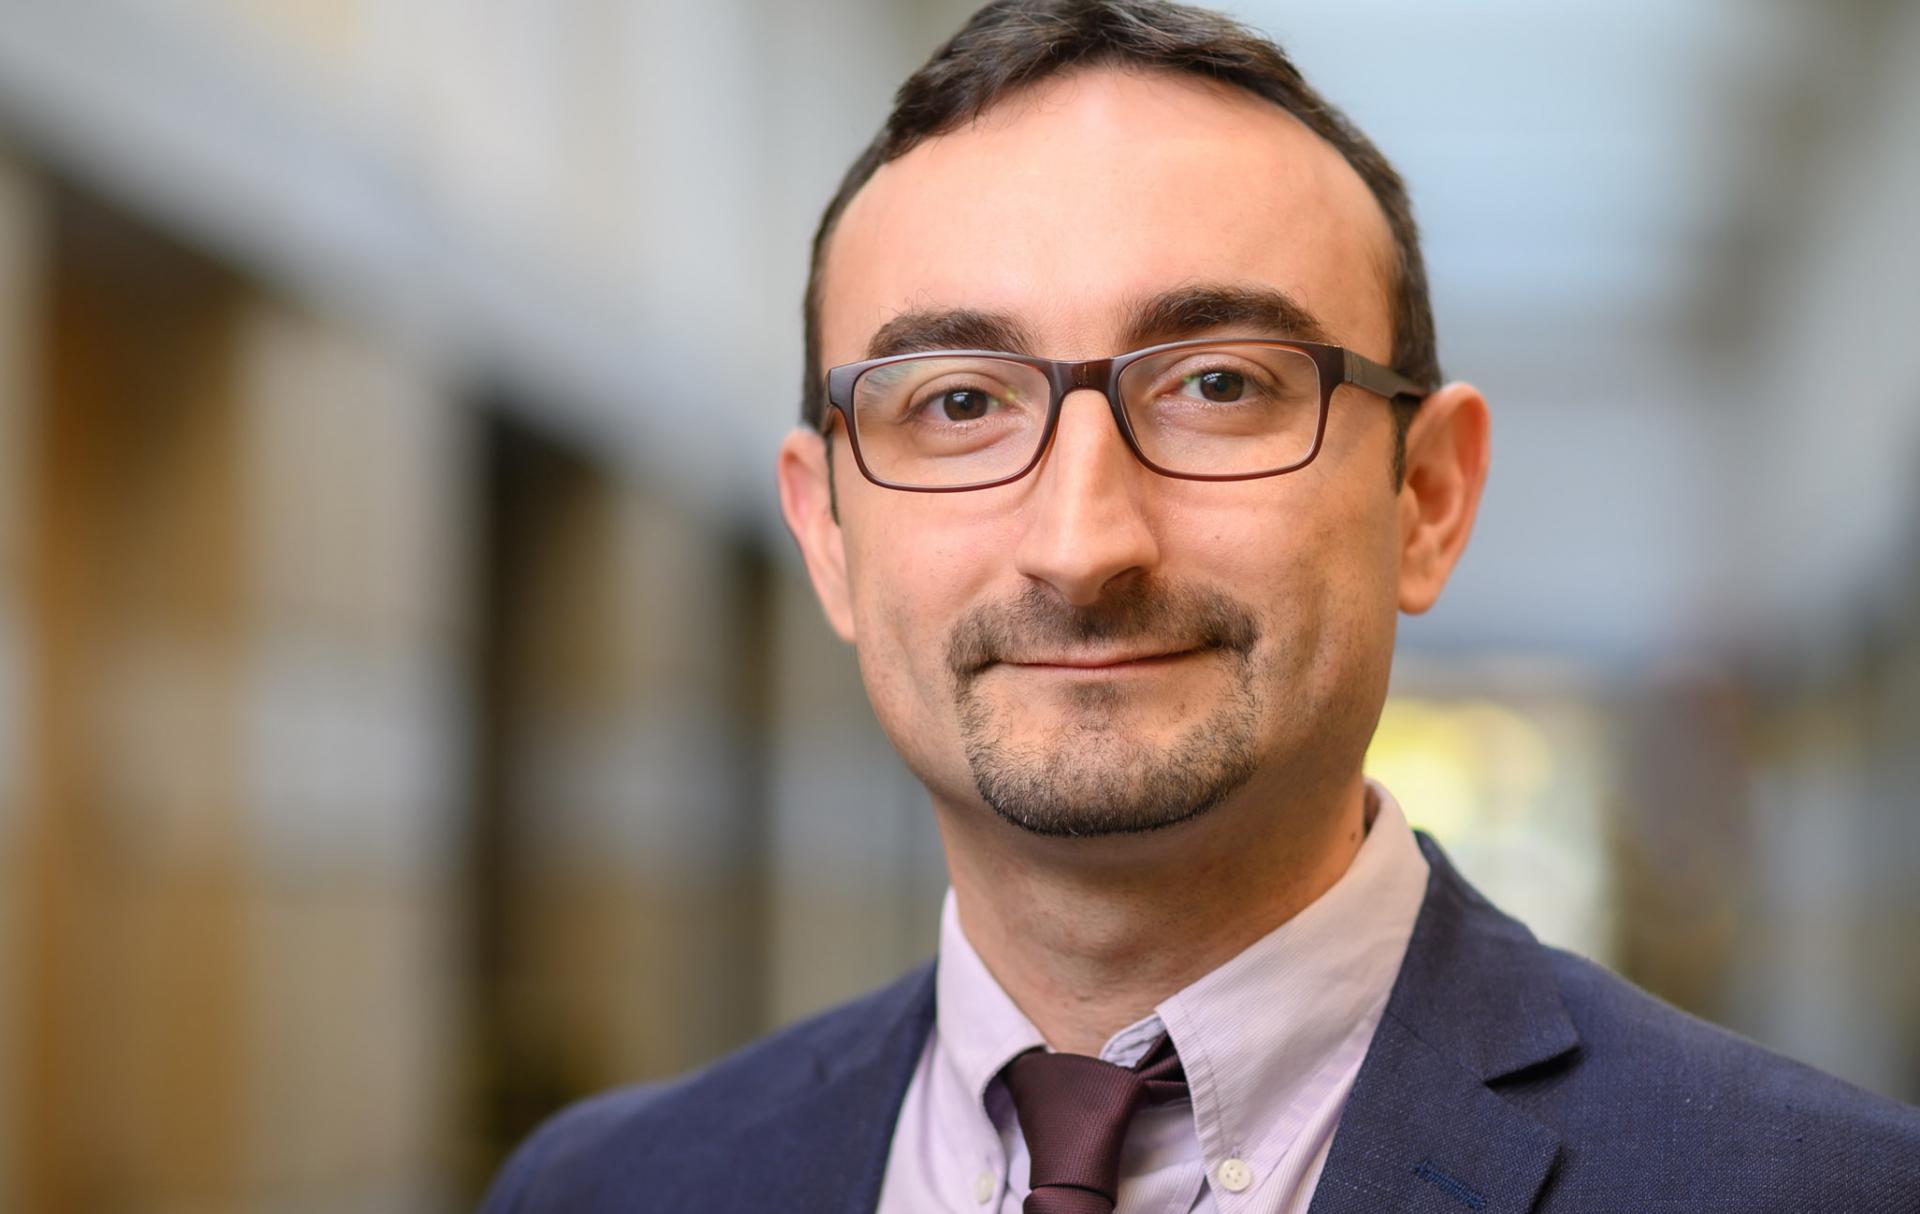 Patrizio Piraino, director of the Ford Program in Human Development Studies and Solidarity